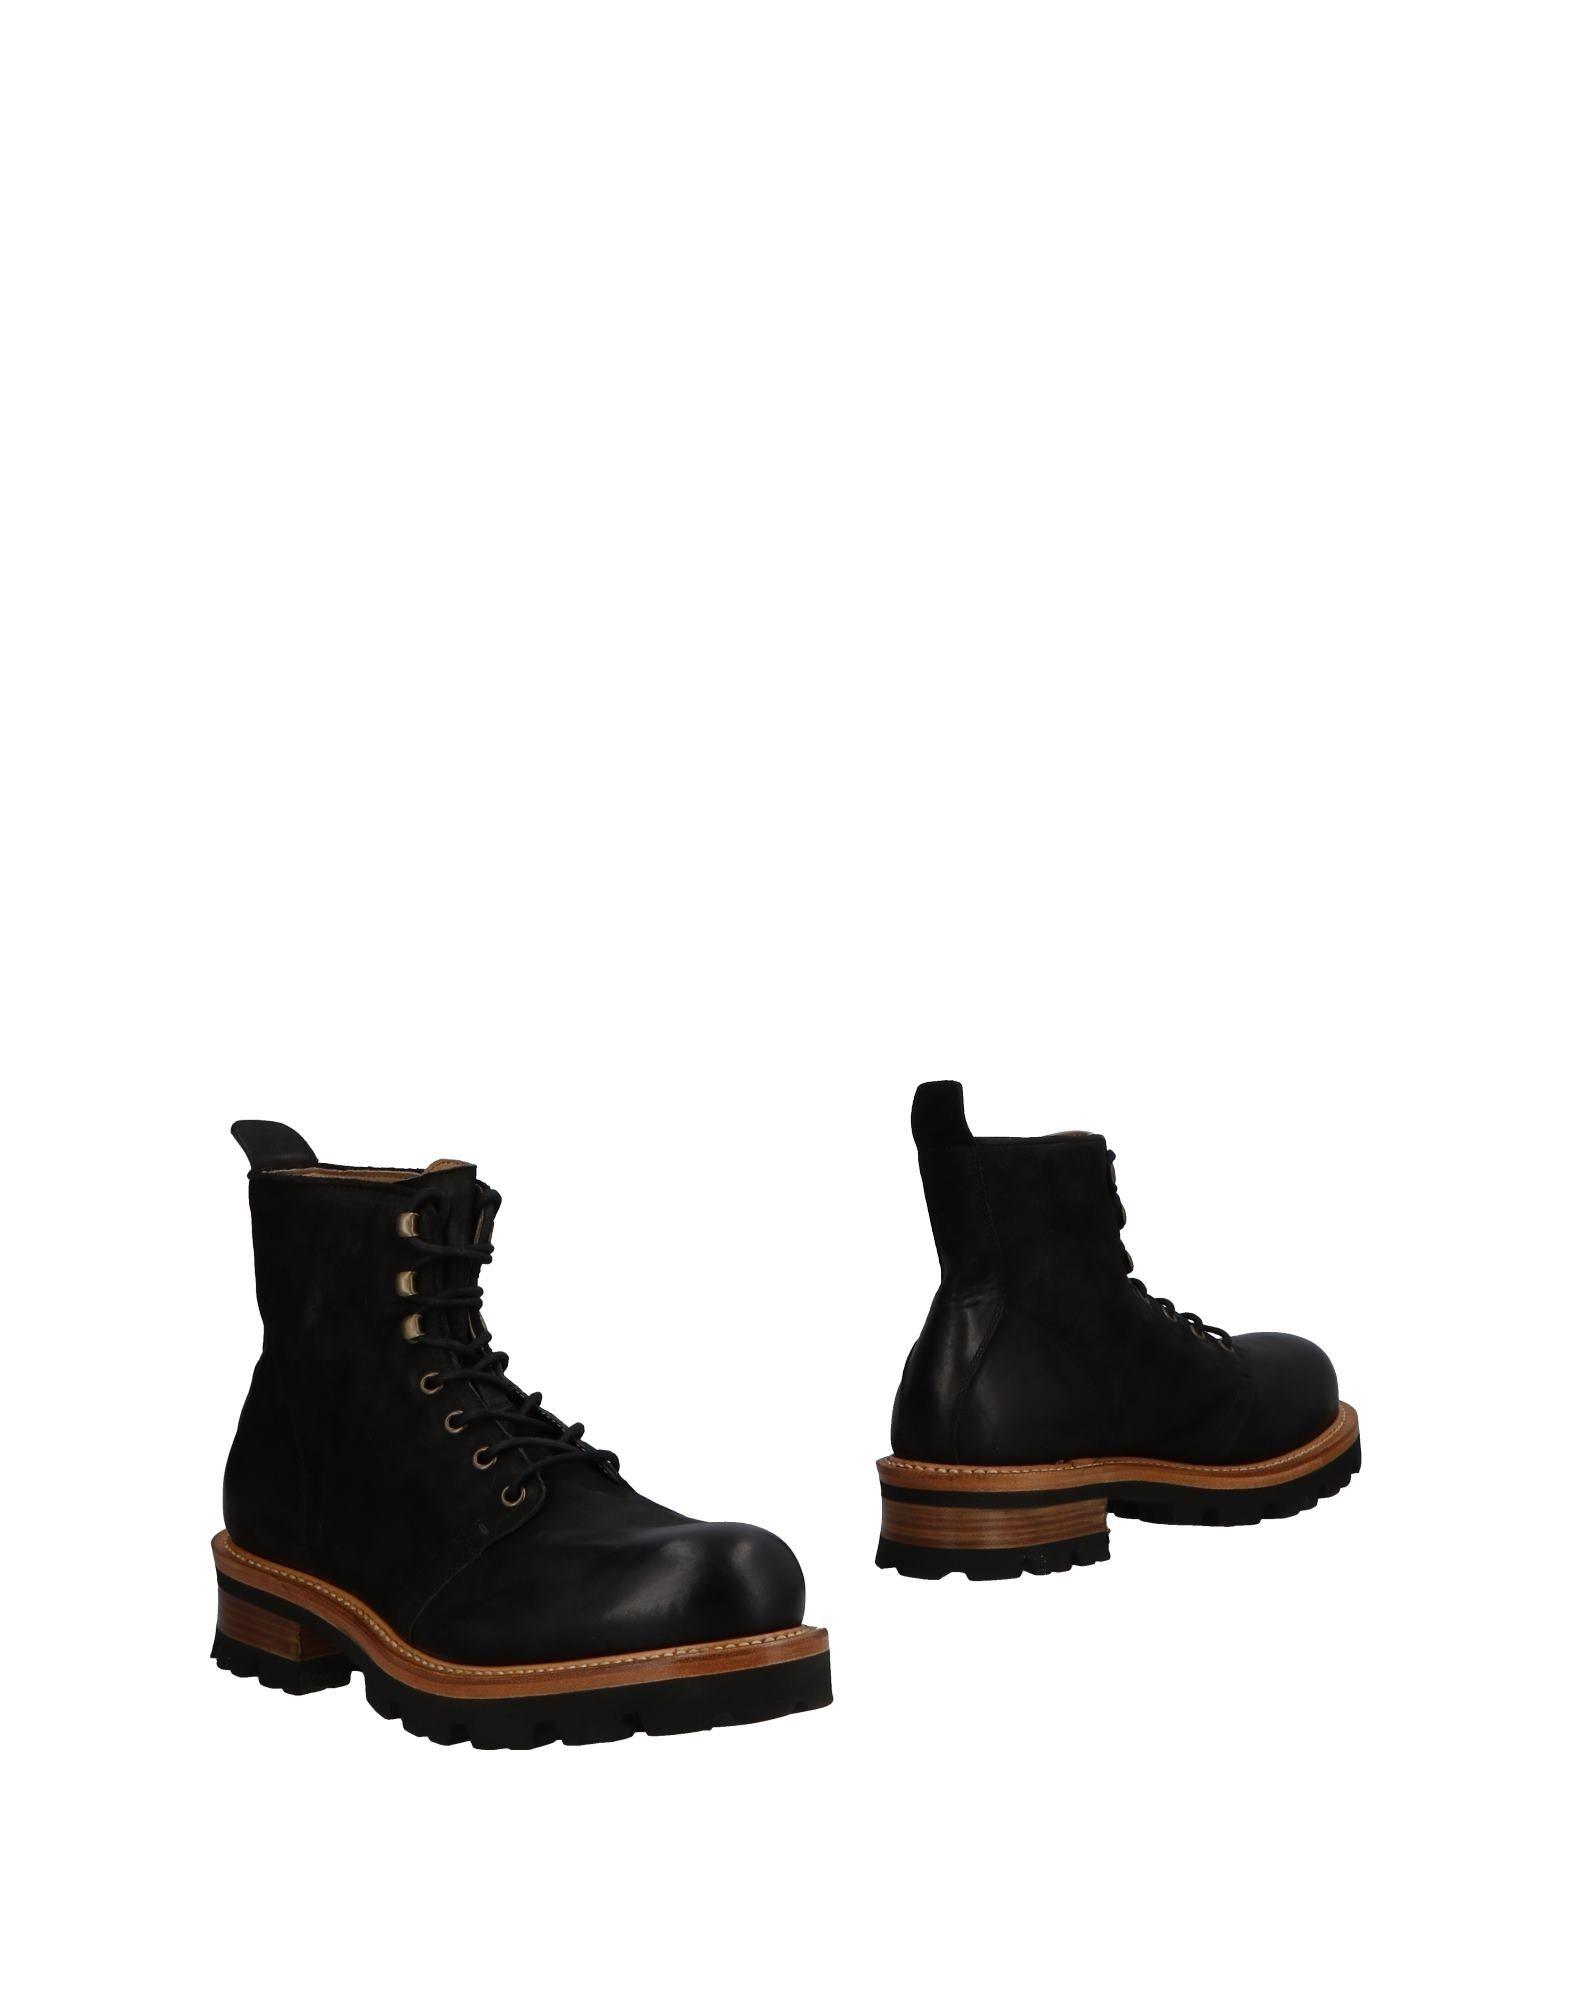 CAPPELLETTI Boots in Black